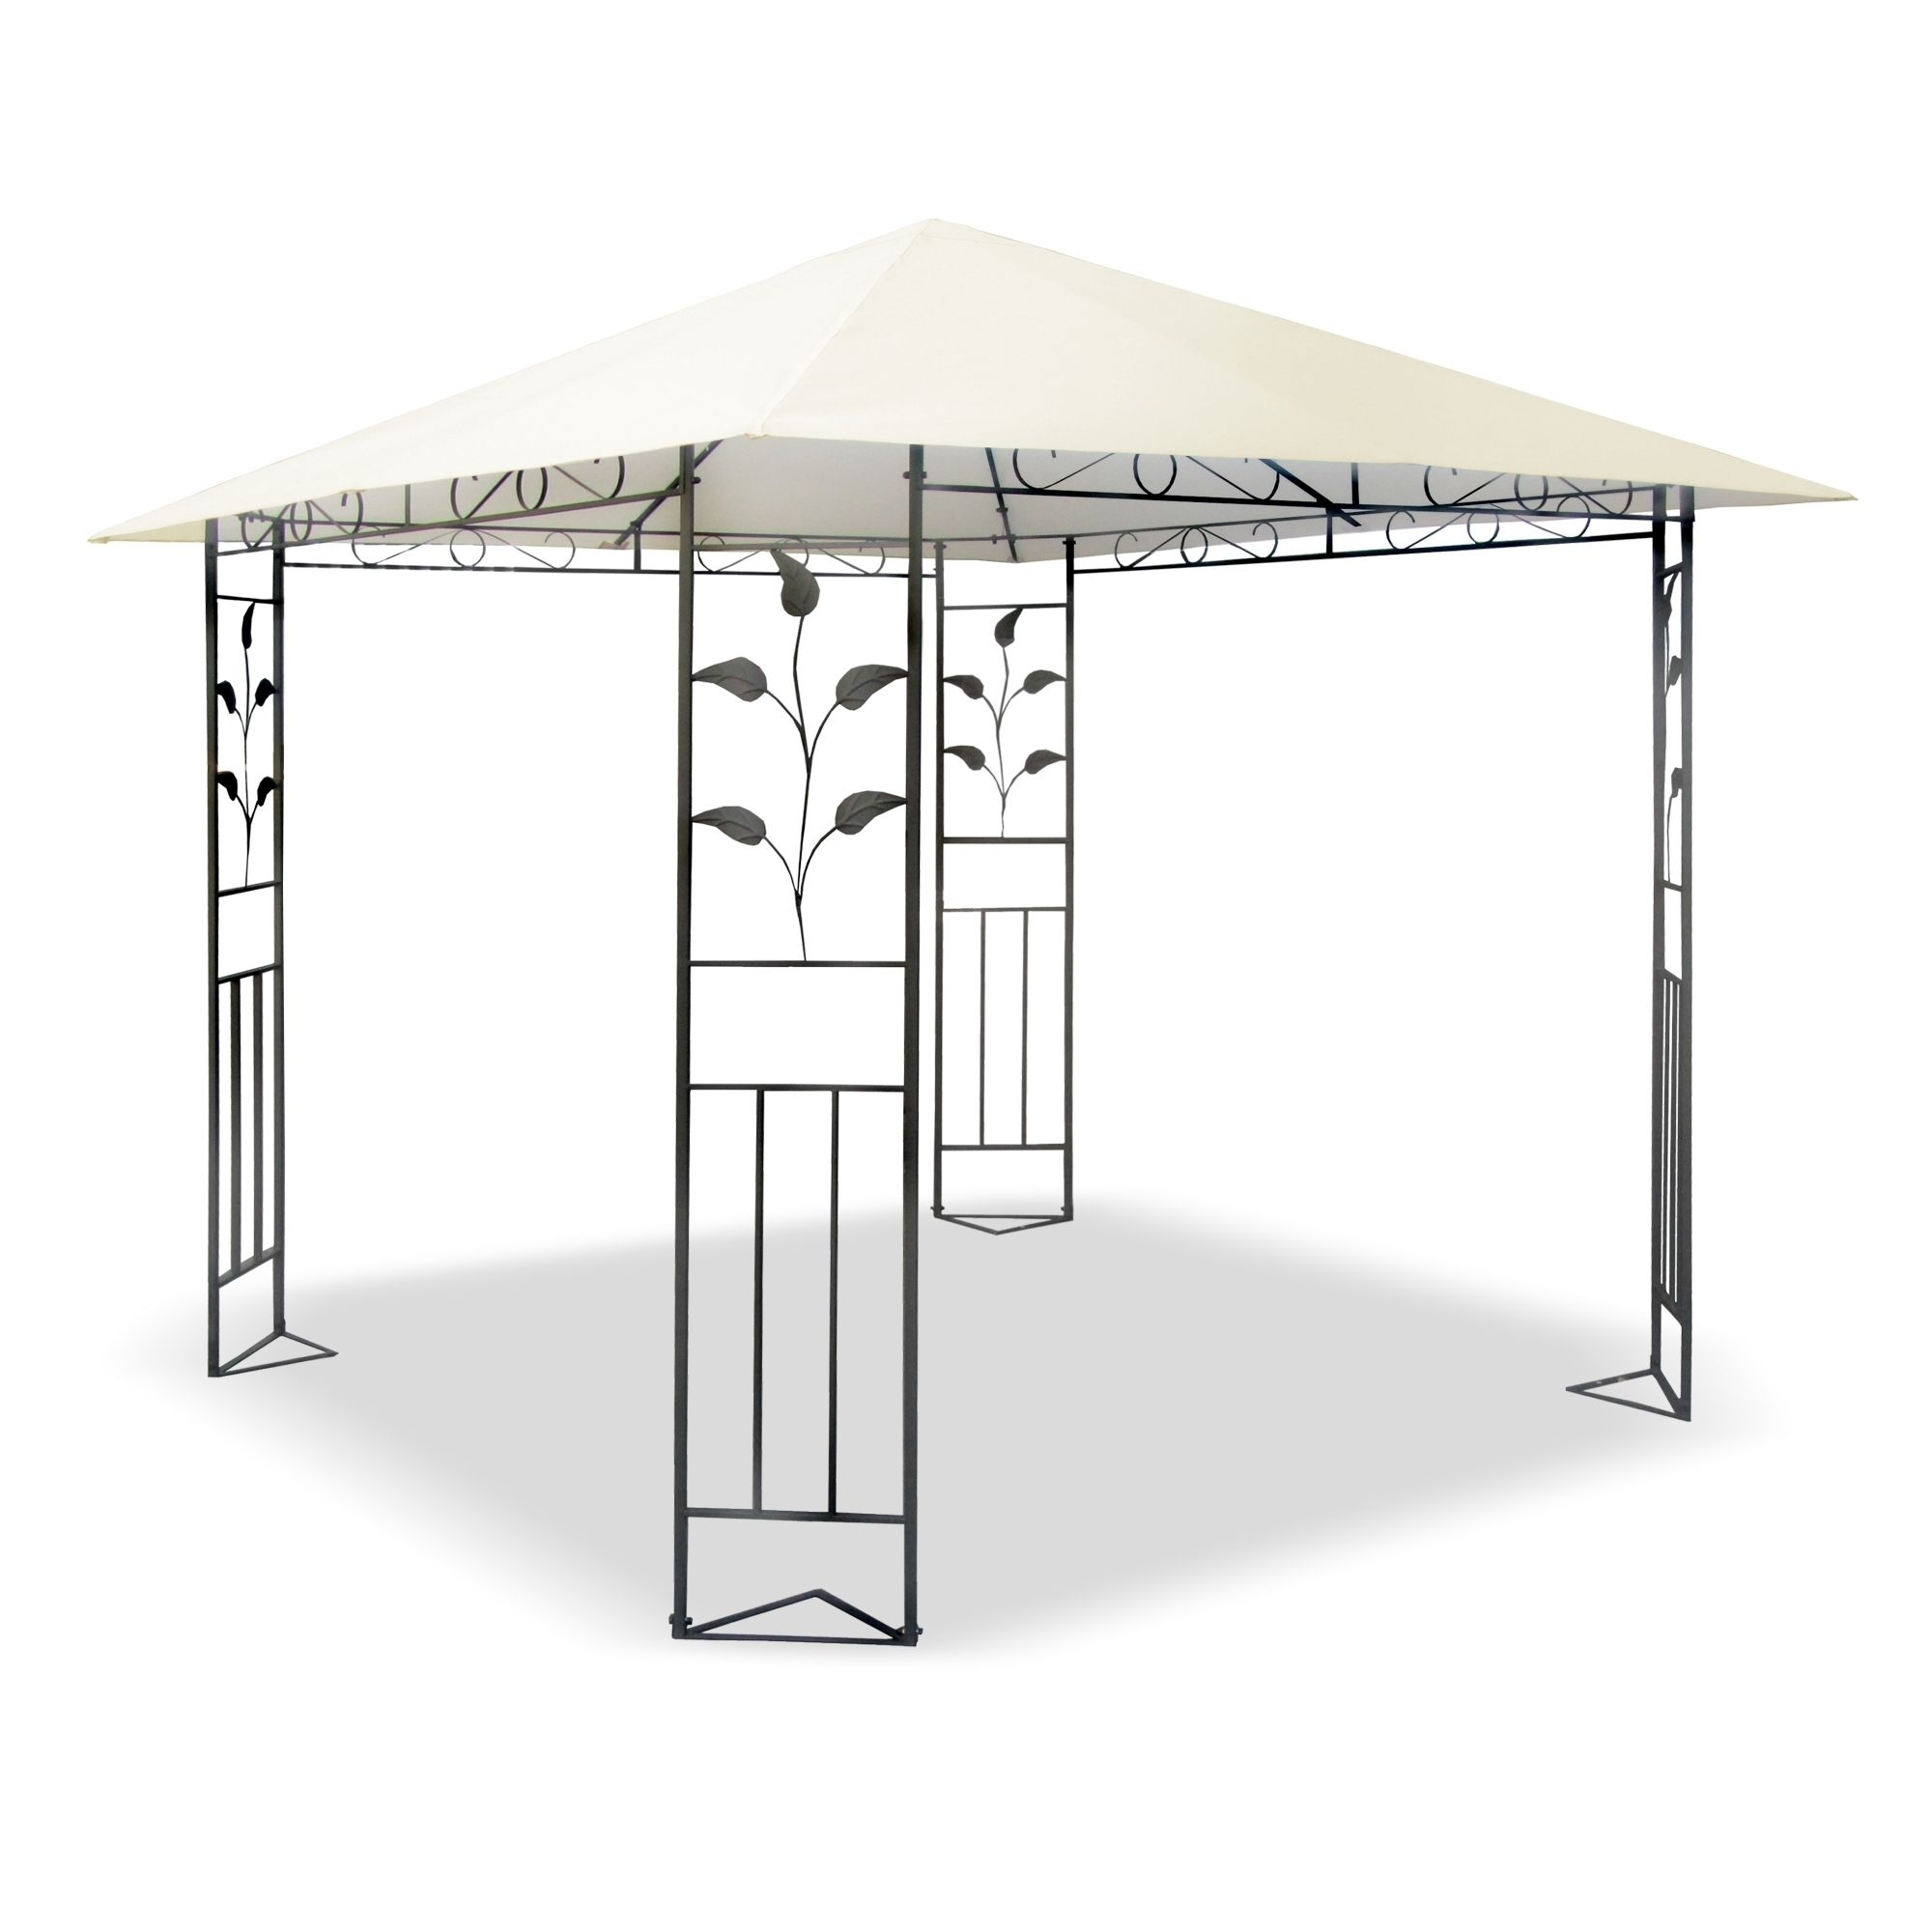 metall pavillon 3 x 3 m mit schmiedeeisen ornamenten. Black Bedroom Furniture Sets. Home Design Ideas